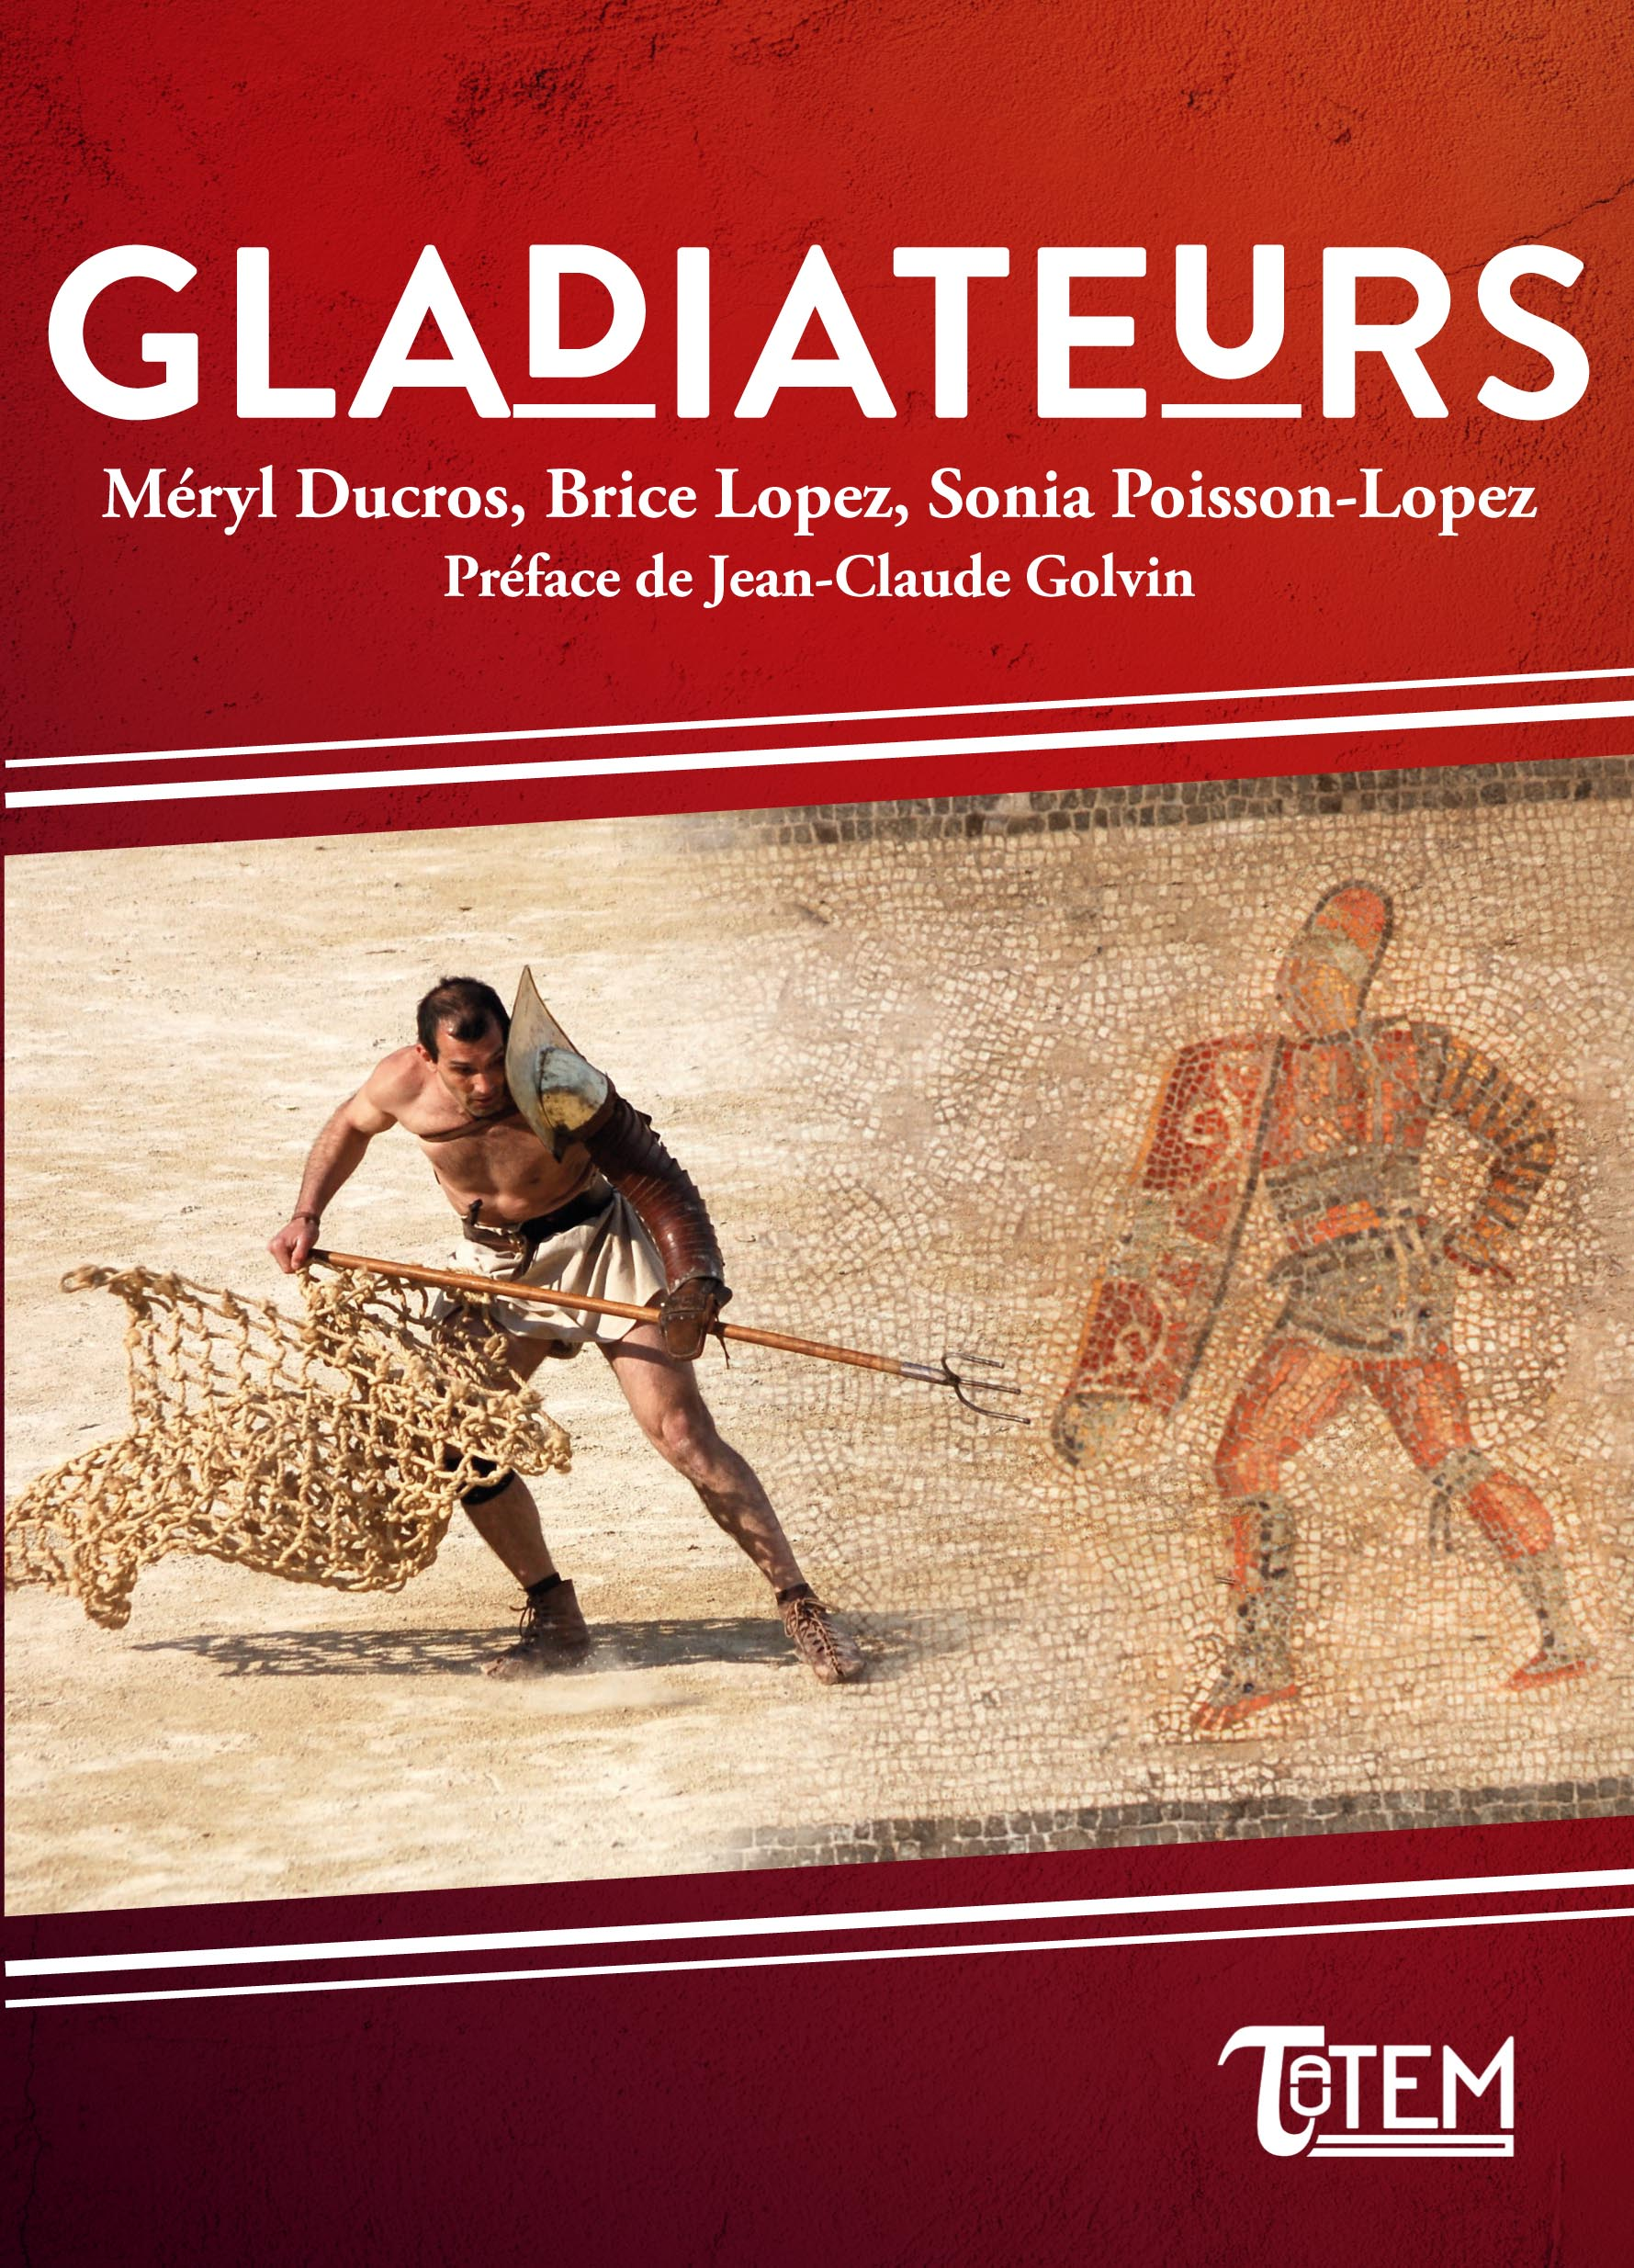 <b>Gladiateurs</b>